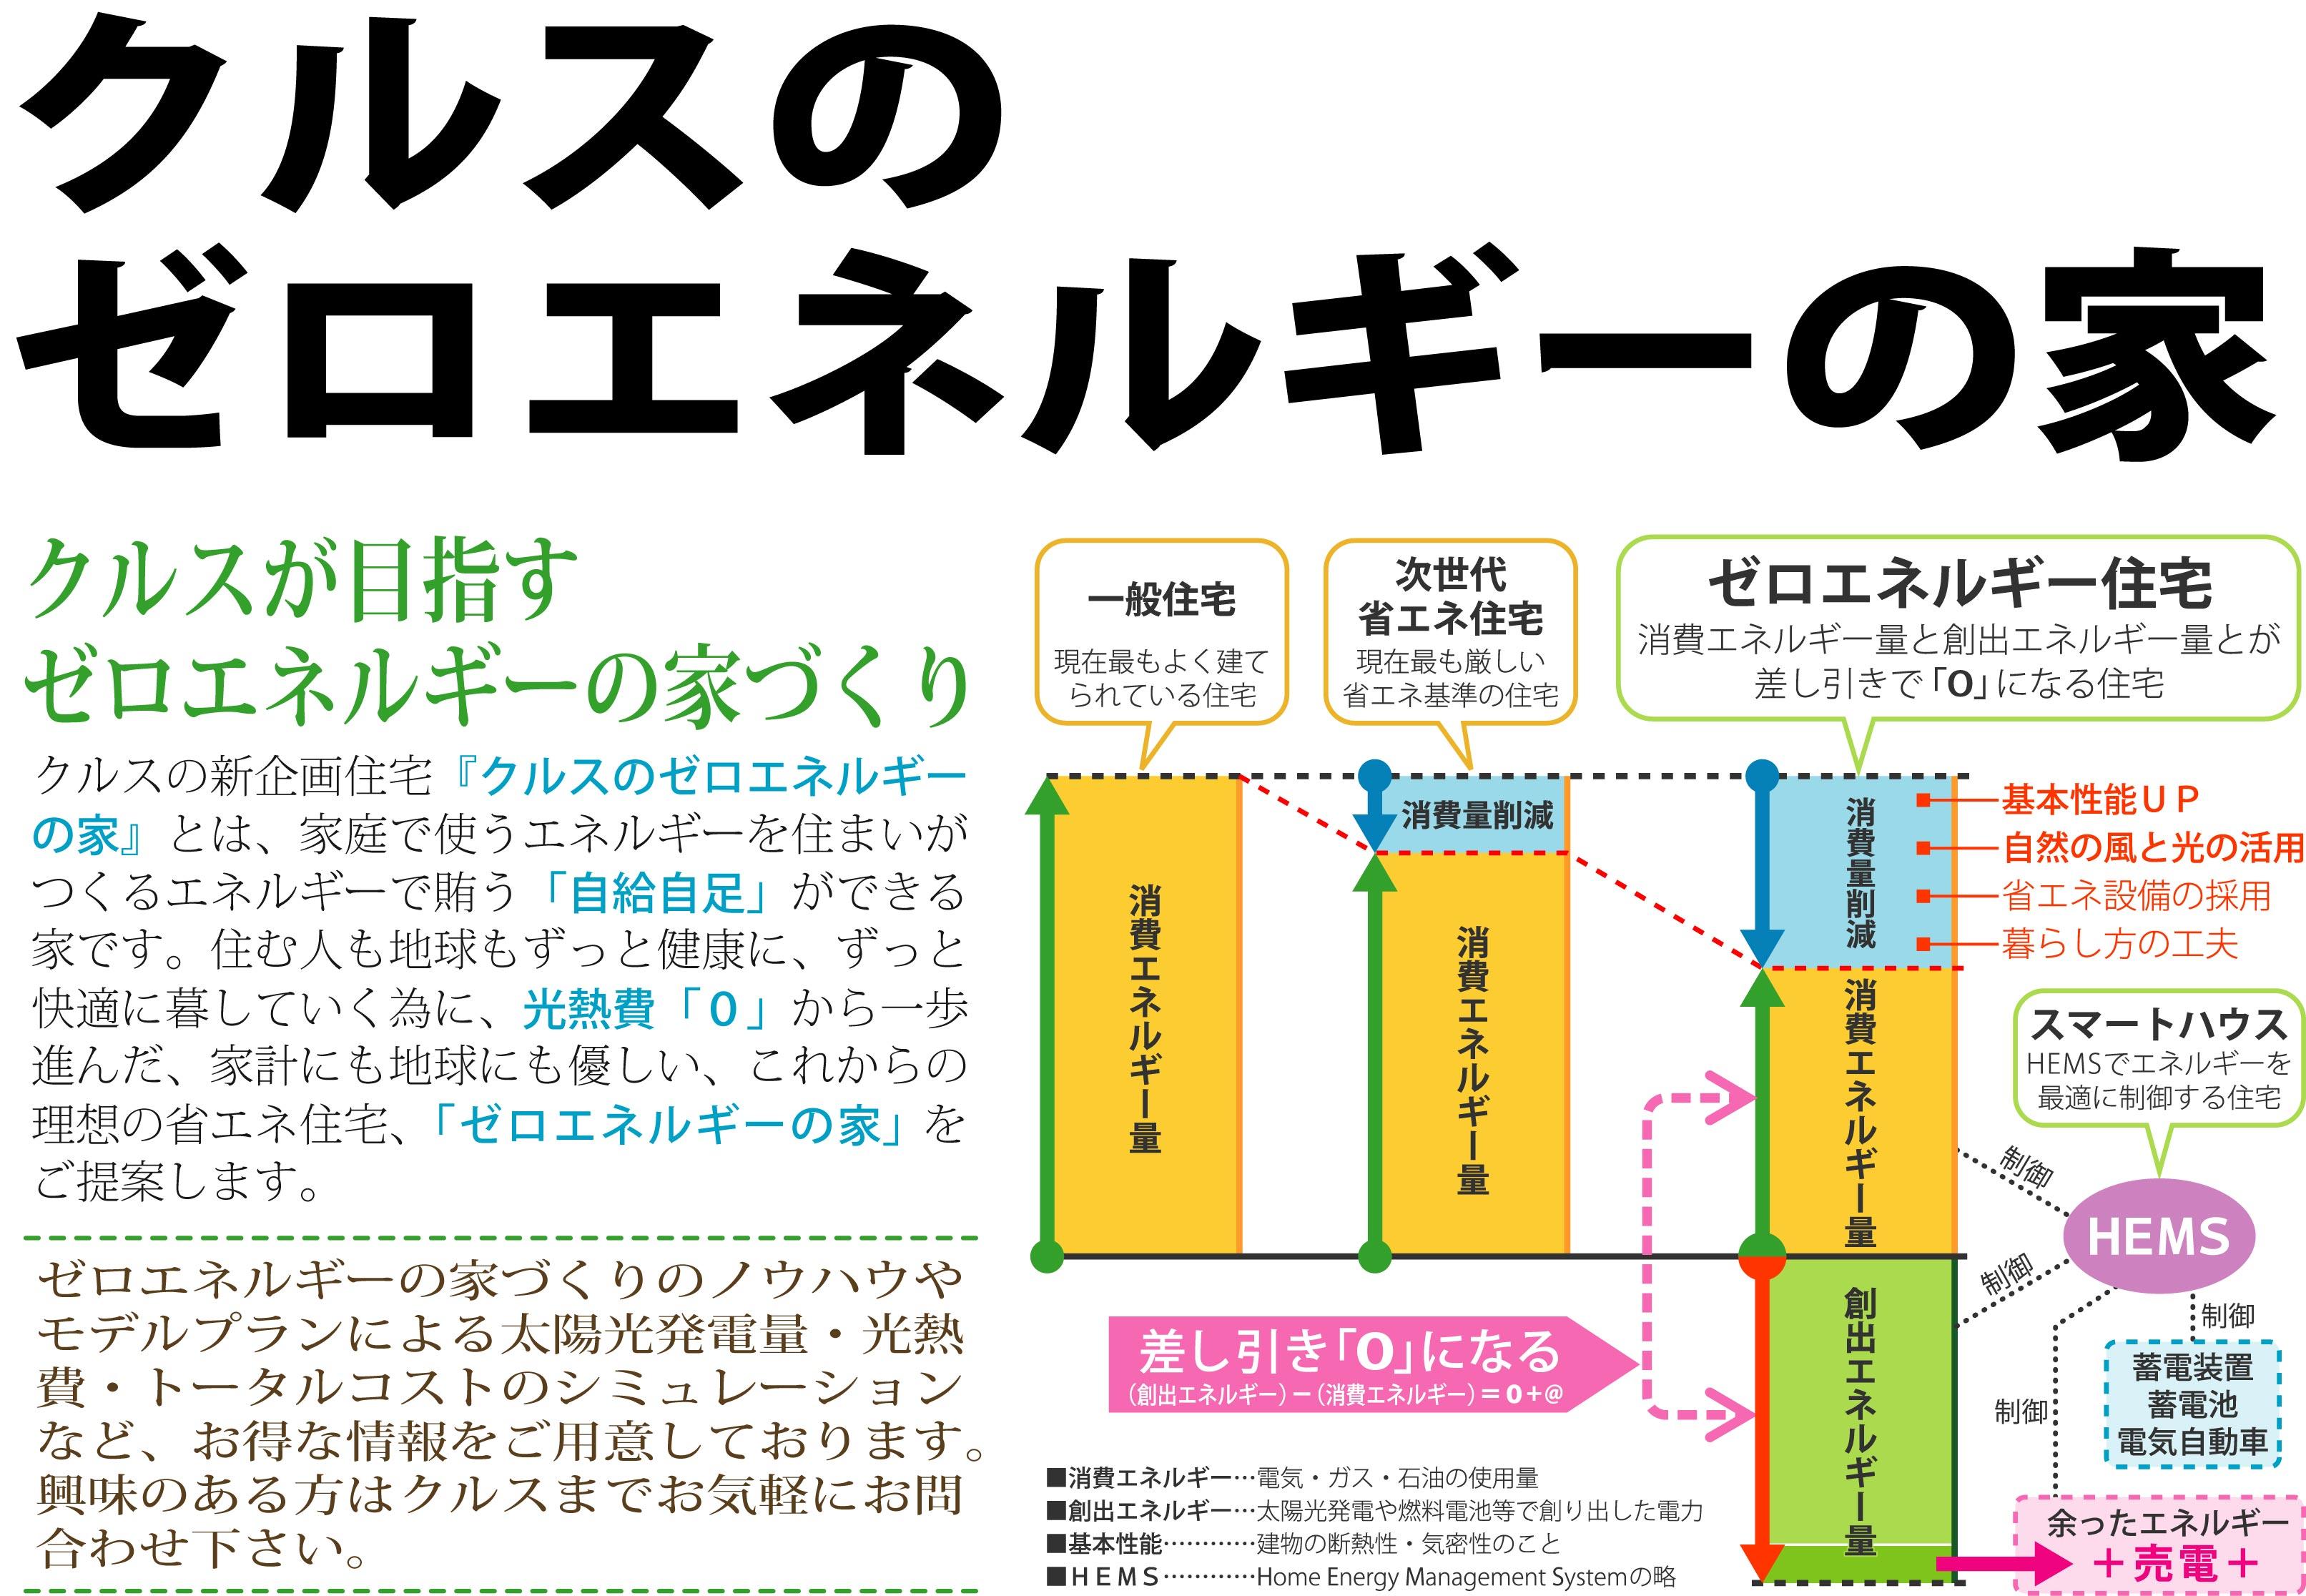 KuraSi-natu-sin74-03.jpg